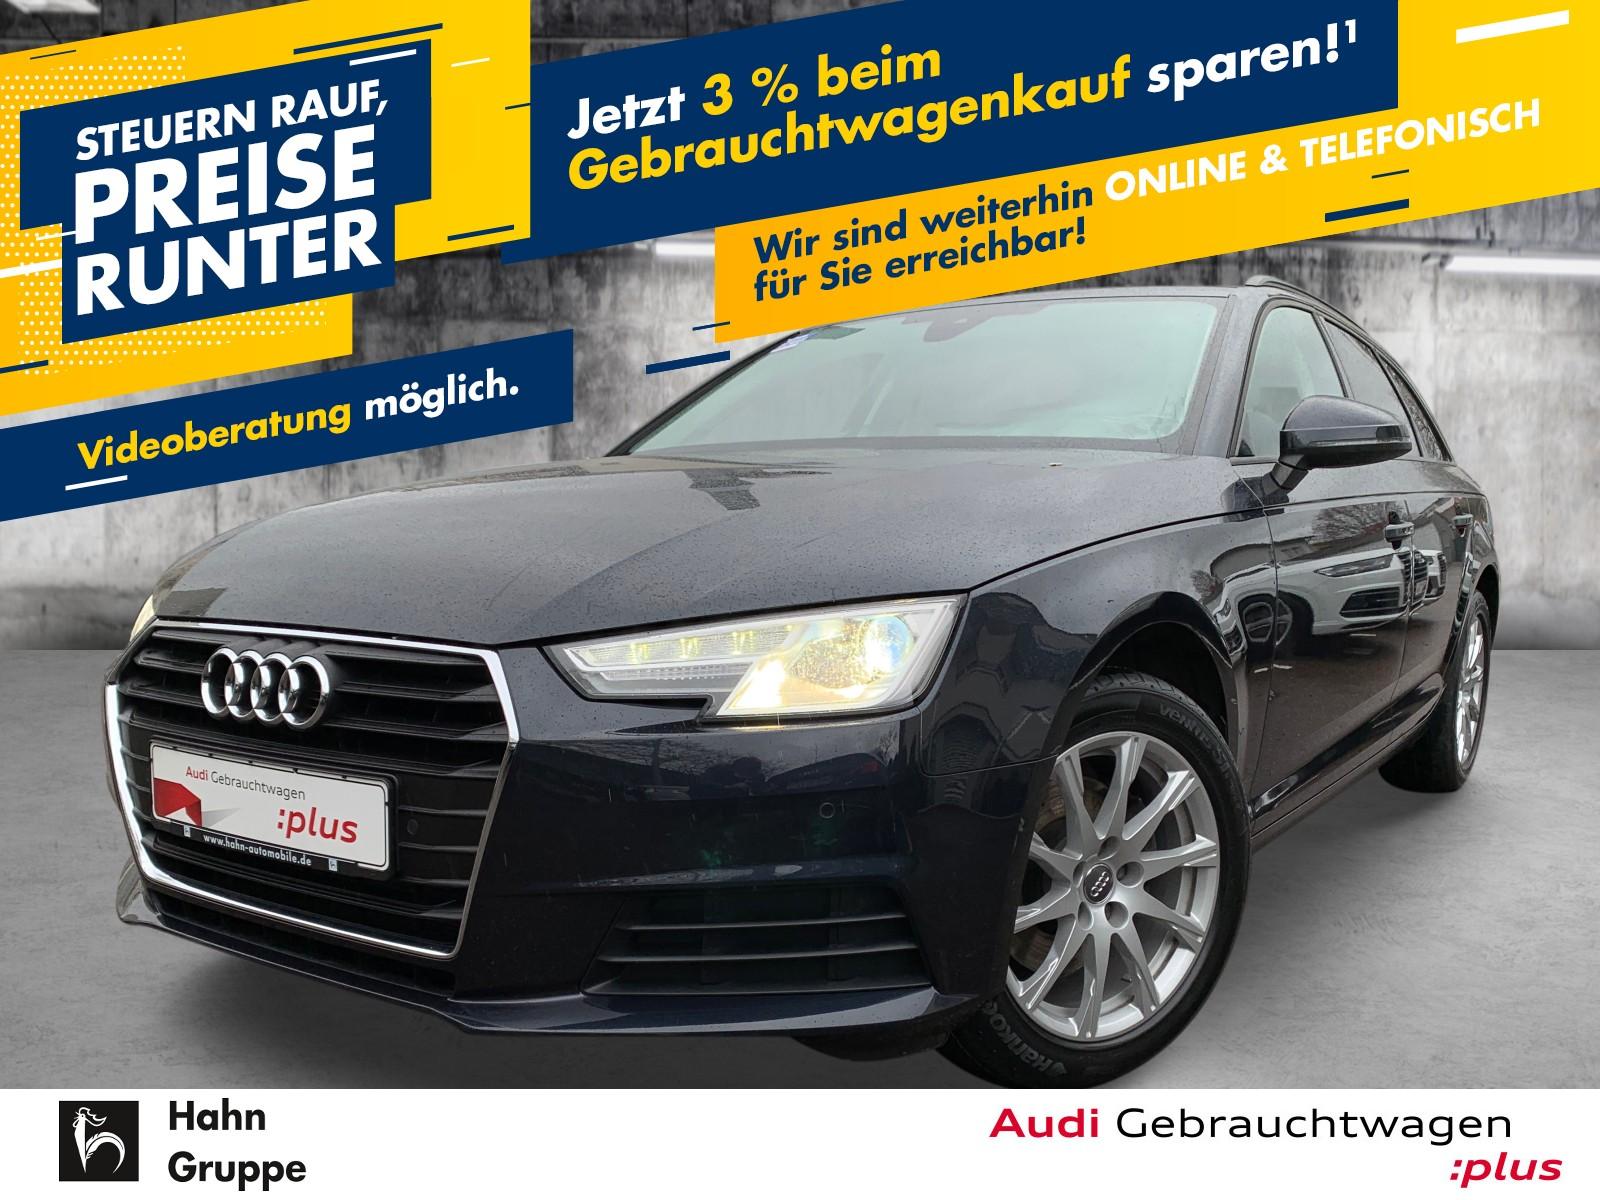 Audi A4 Avant 2.0TDI S-trc Navi Xen AHK Sitzh Einpark, Jahr 2016, Diesel